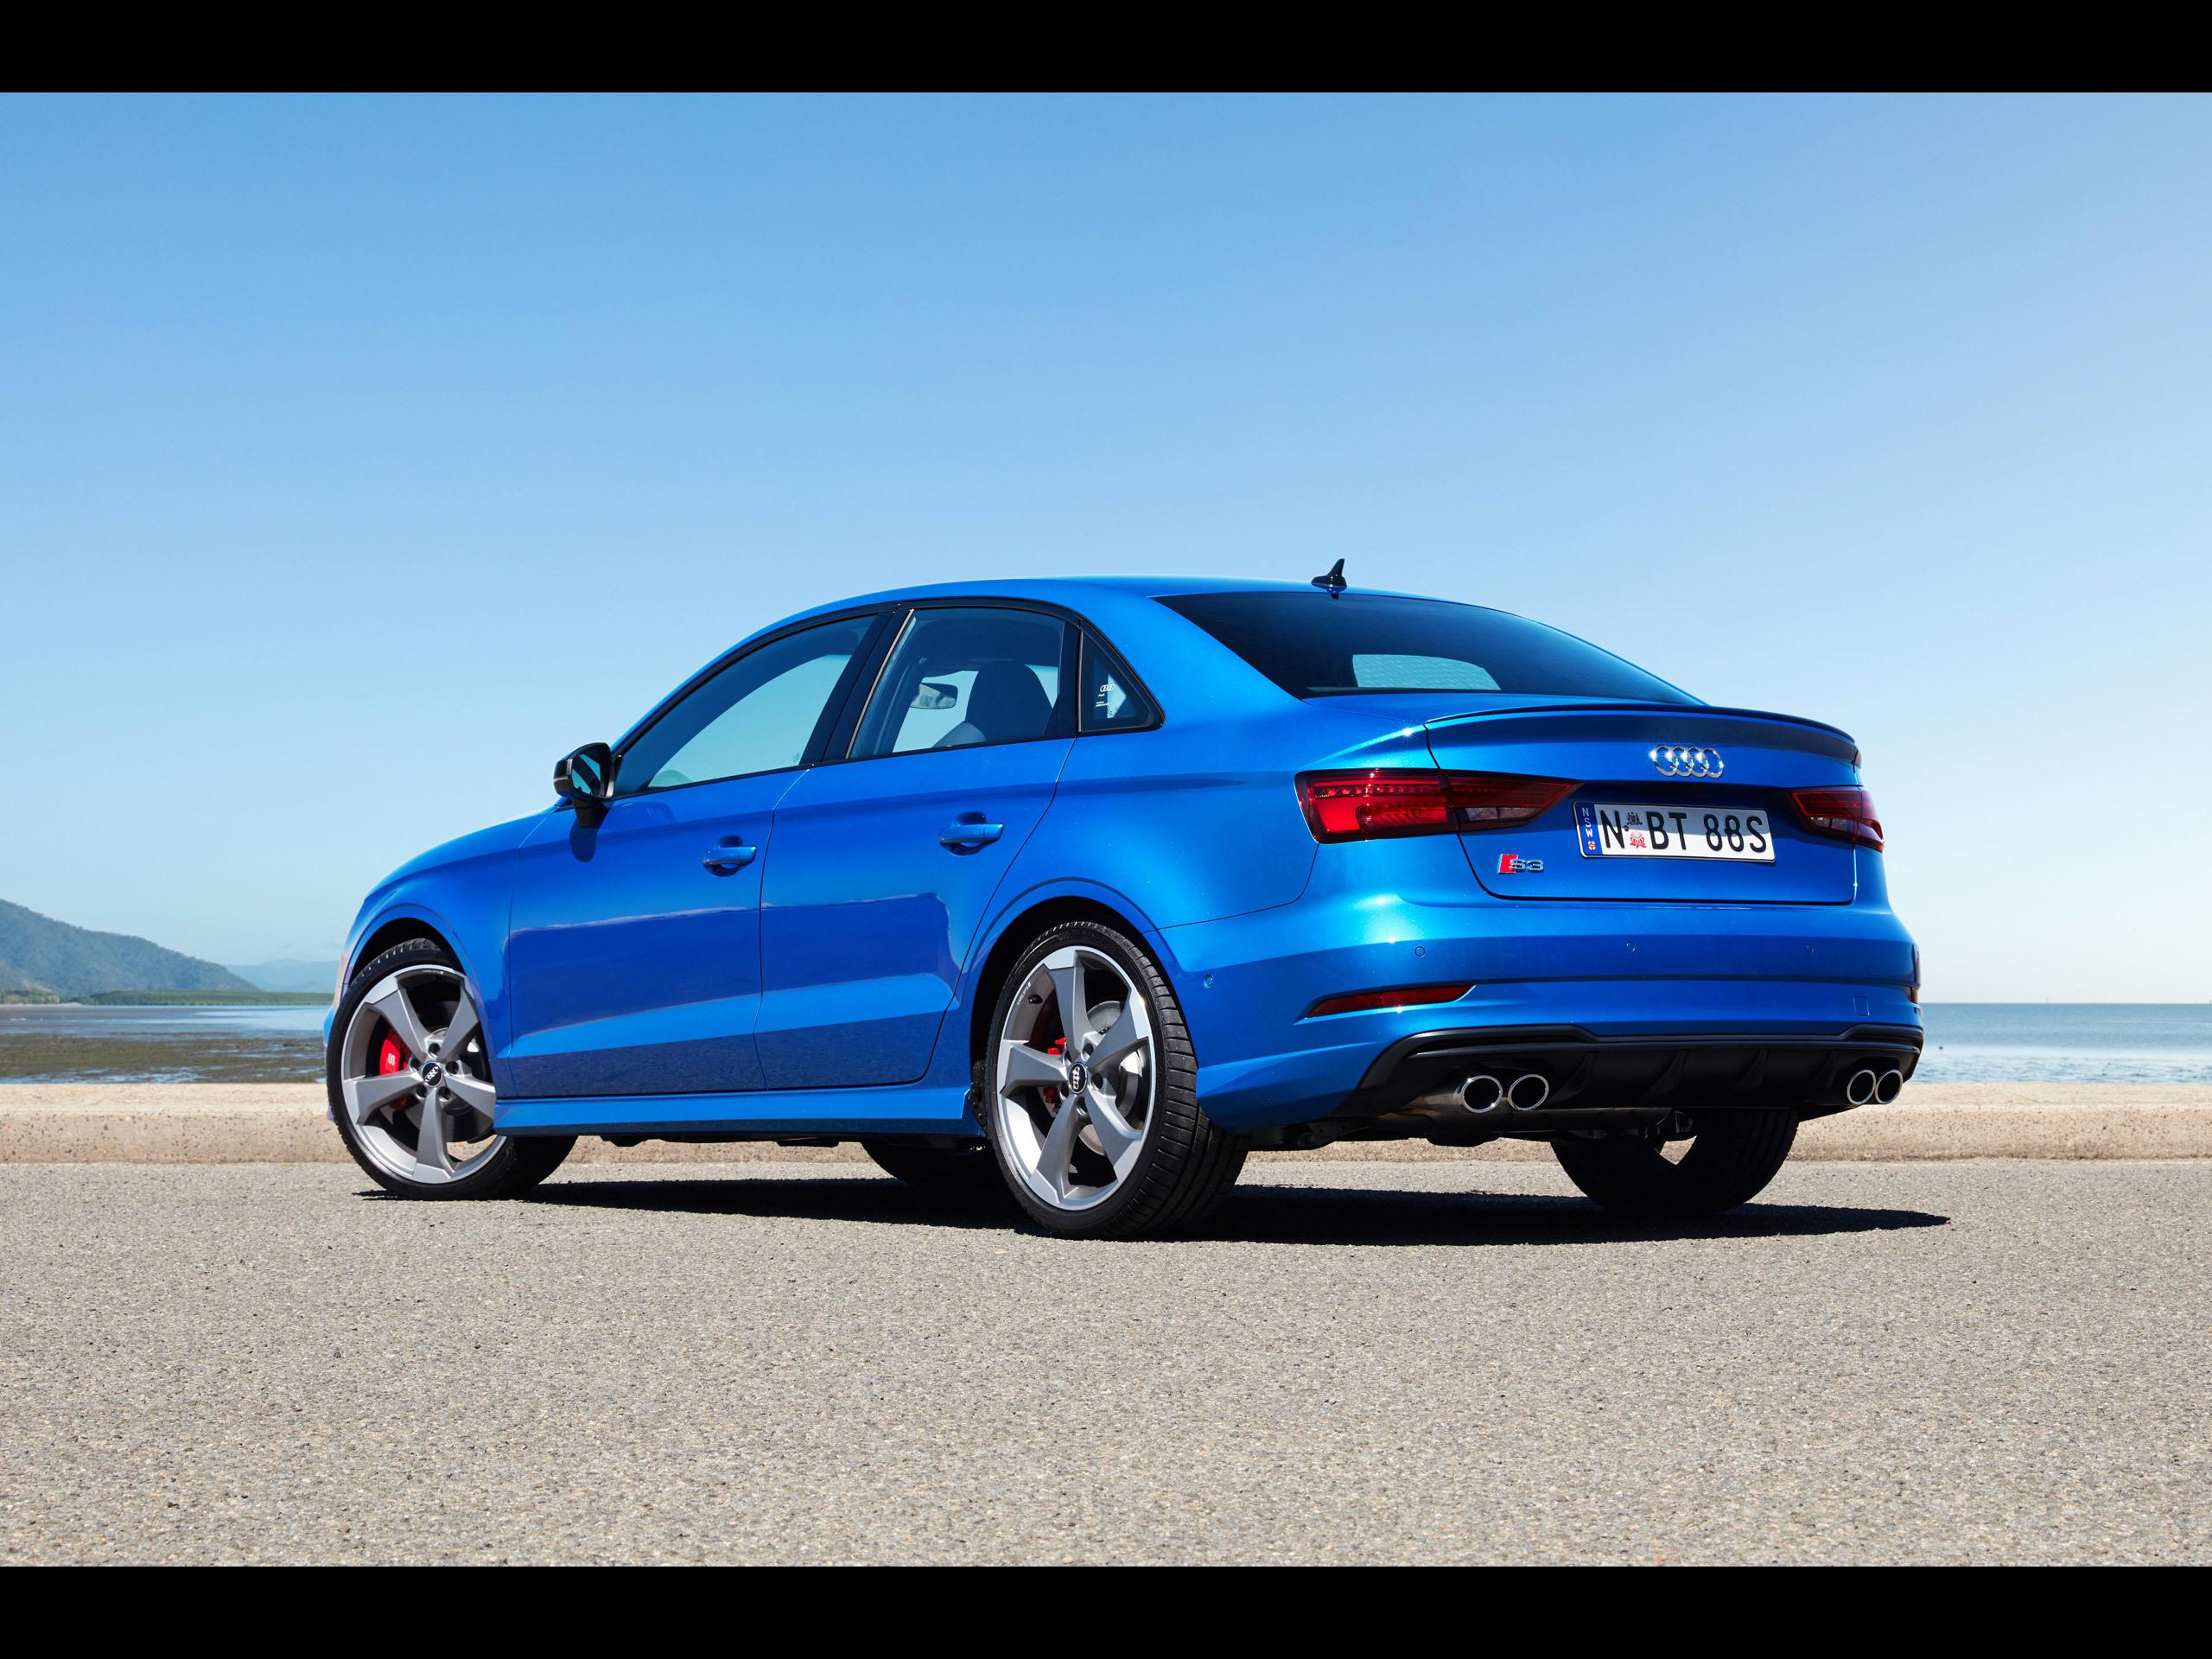 Audi S3 Sedan 2019 - アウディに嵌まる - 壁紙画像ブログ